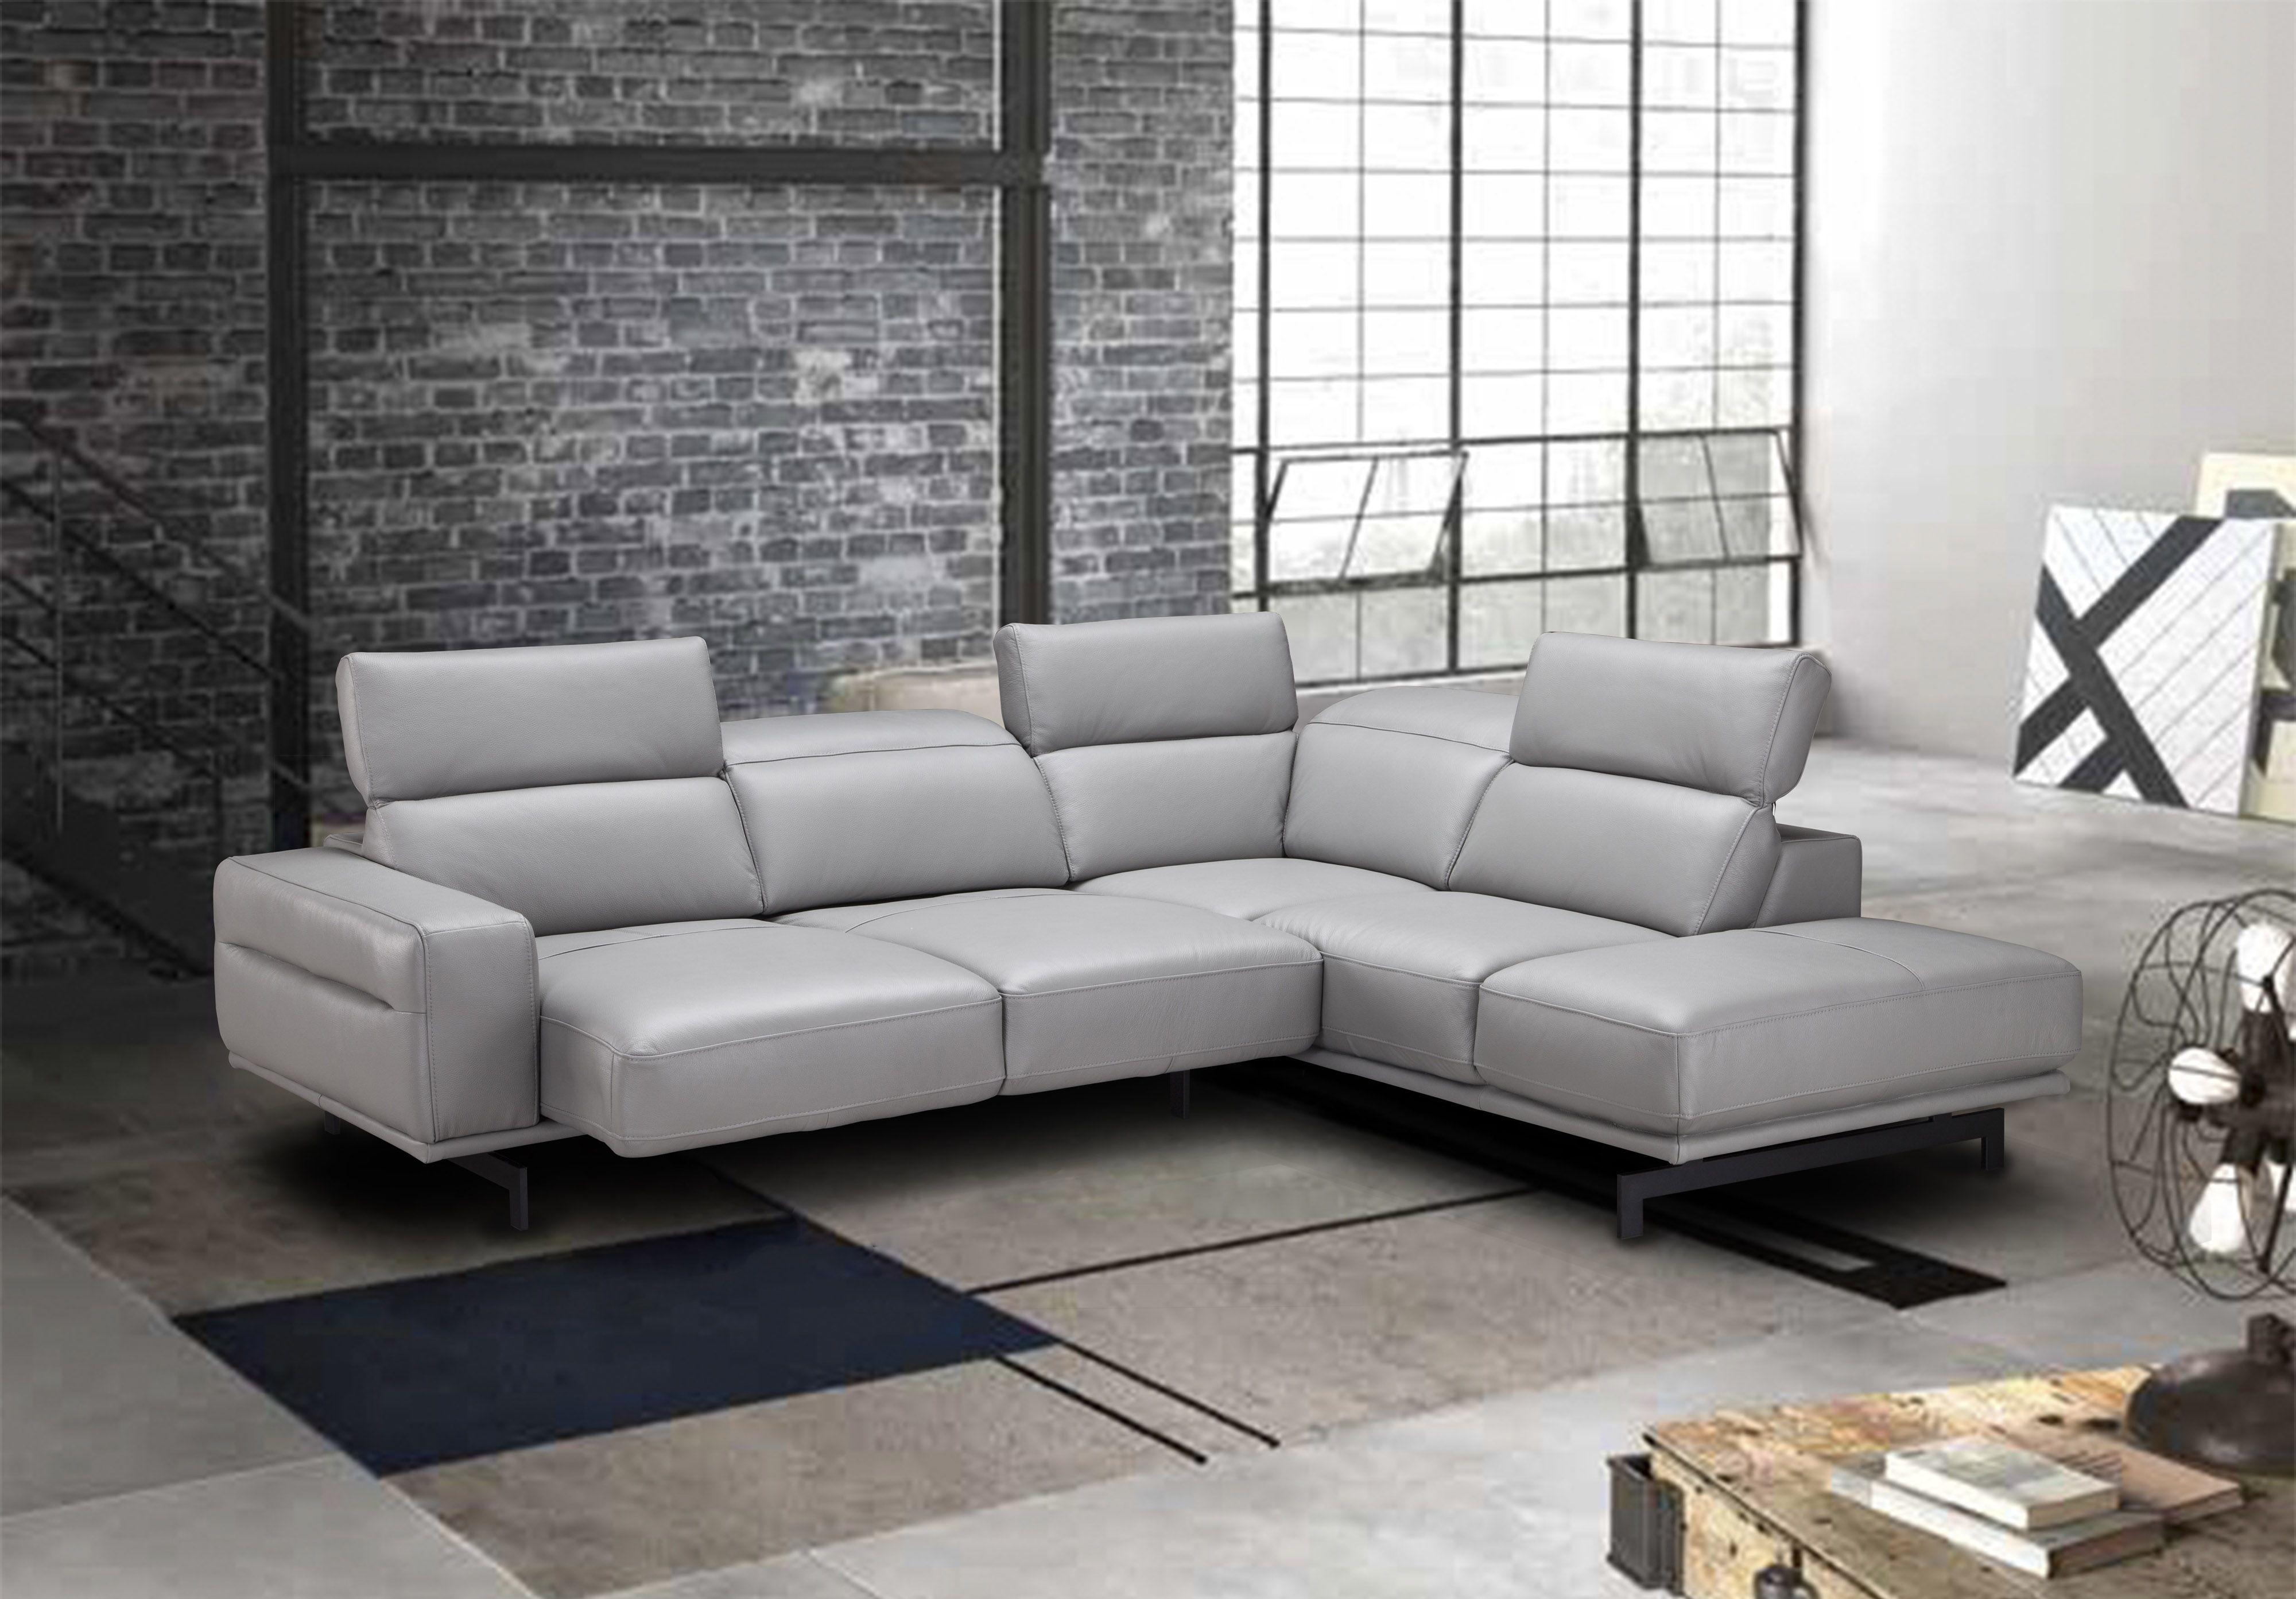 Adjustable Advanced Italian Top Grain Leather Sectional Sofa In